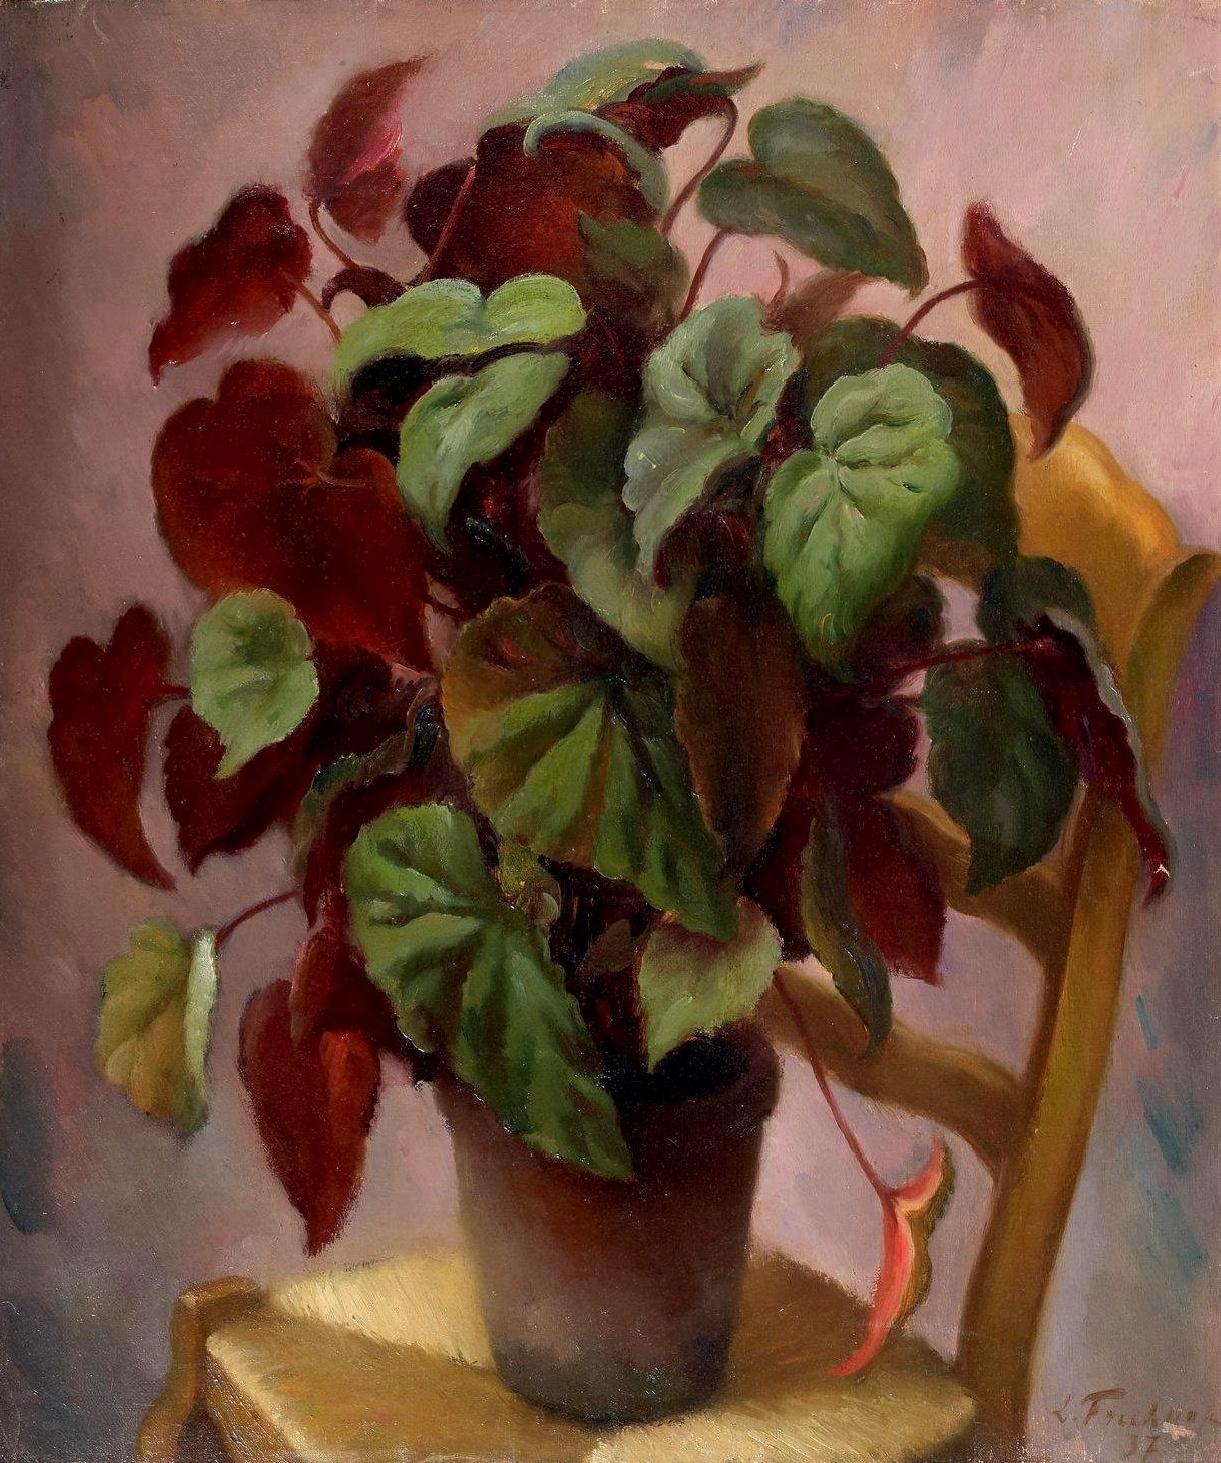 Green Plant)_70 х 60.jpg